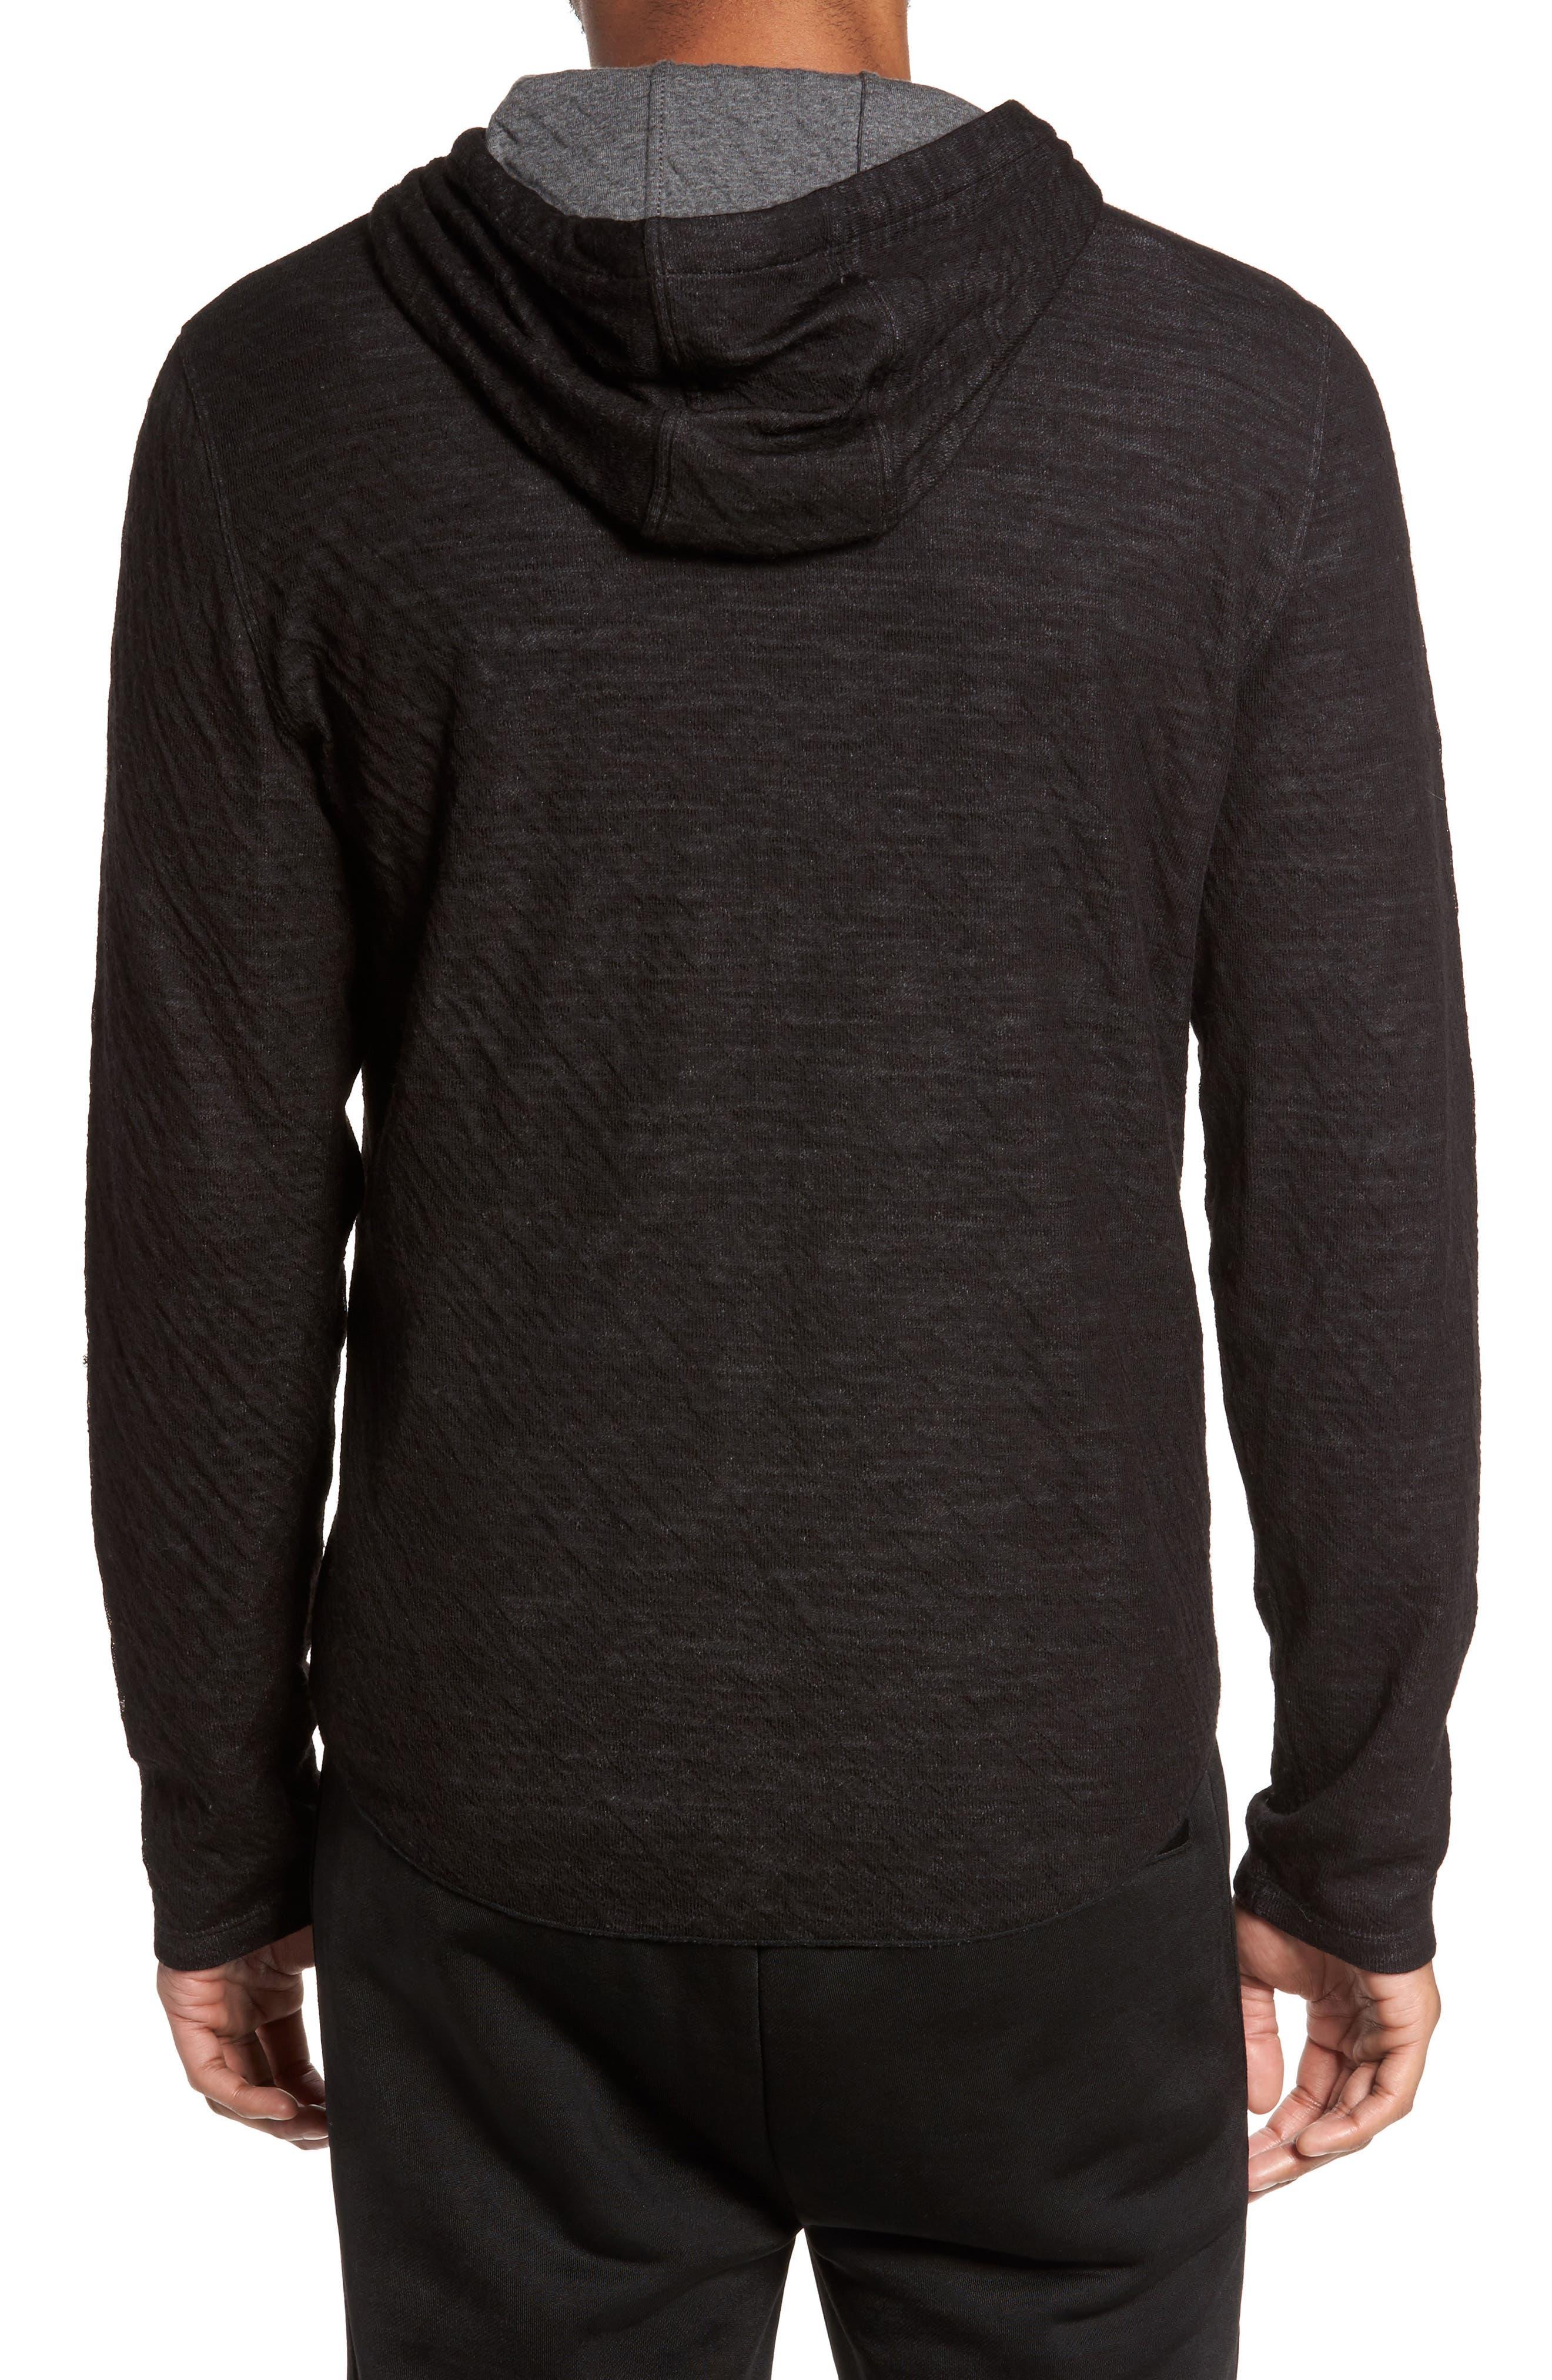 Contrast Double Knit Cotton & Wool Hoodie,                             Alternate thumbnail 2, color,                             Black/ H Carbon